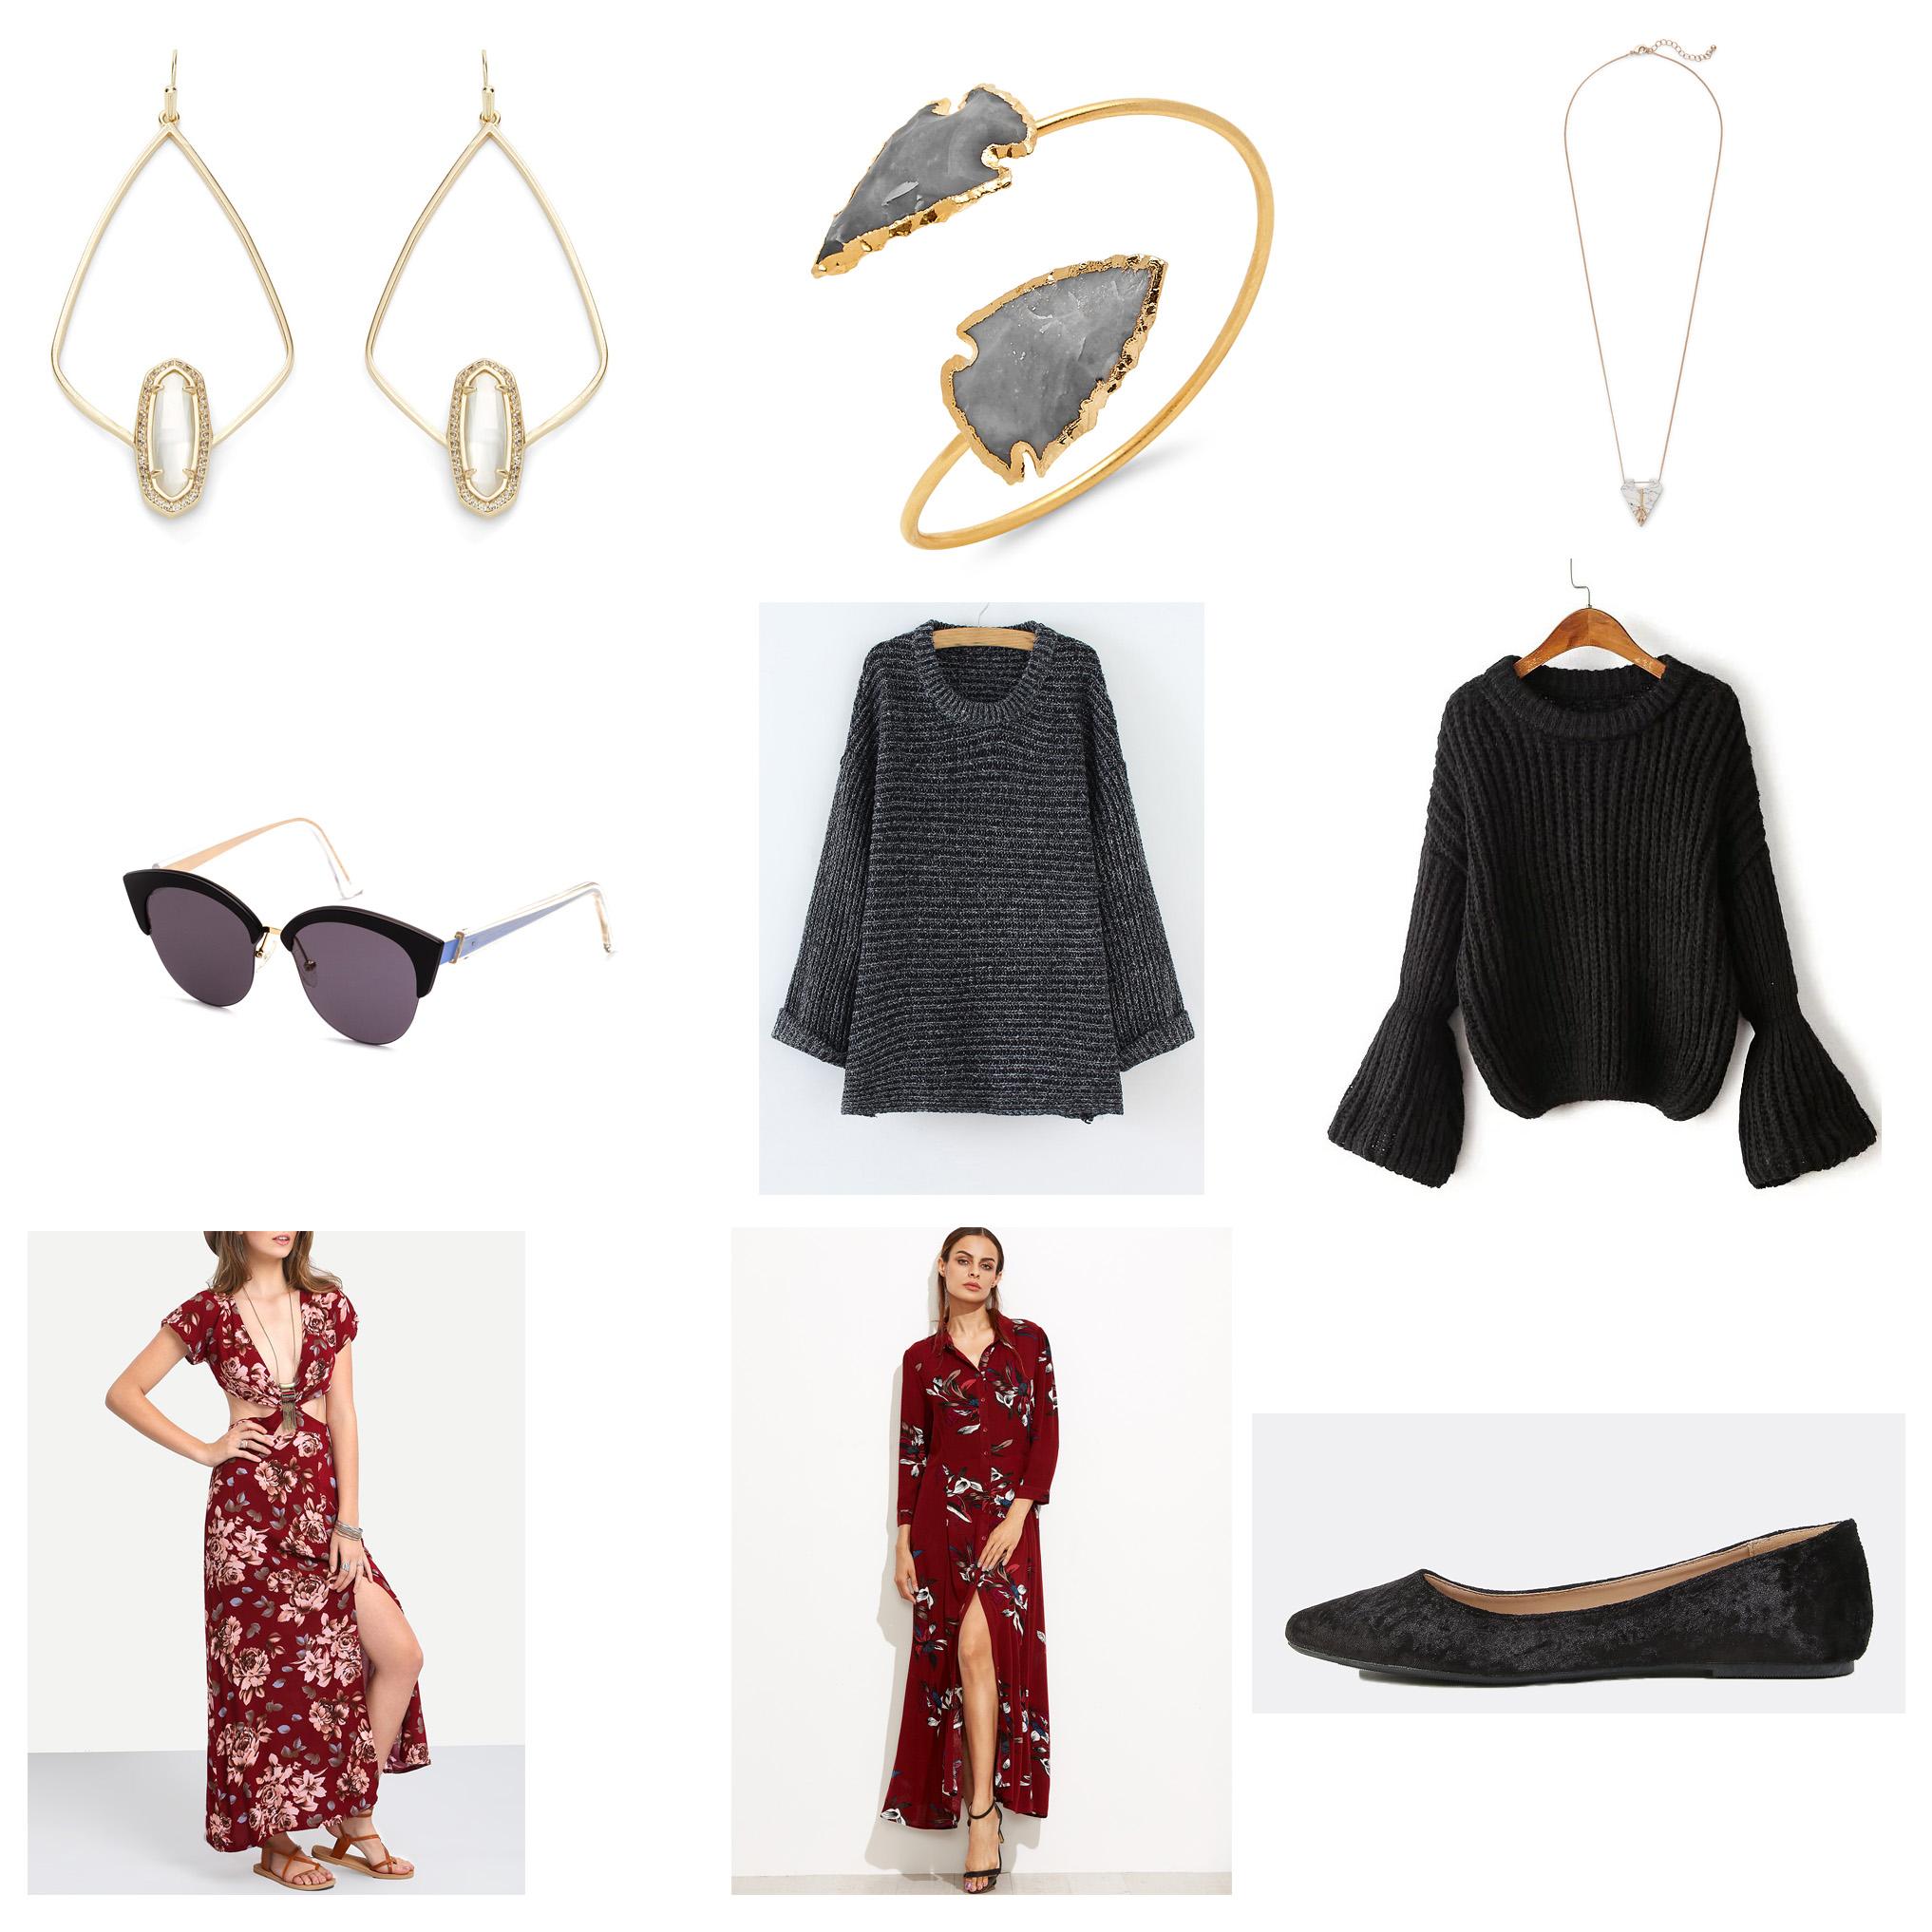 Outfit Links:  Earrings ,  Cuff ,  Necklace ,  Sunglasses ,  Sweater ,  Alternative Sweater ,  Dress ,  Alternative Dress ,  Shoes